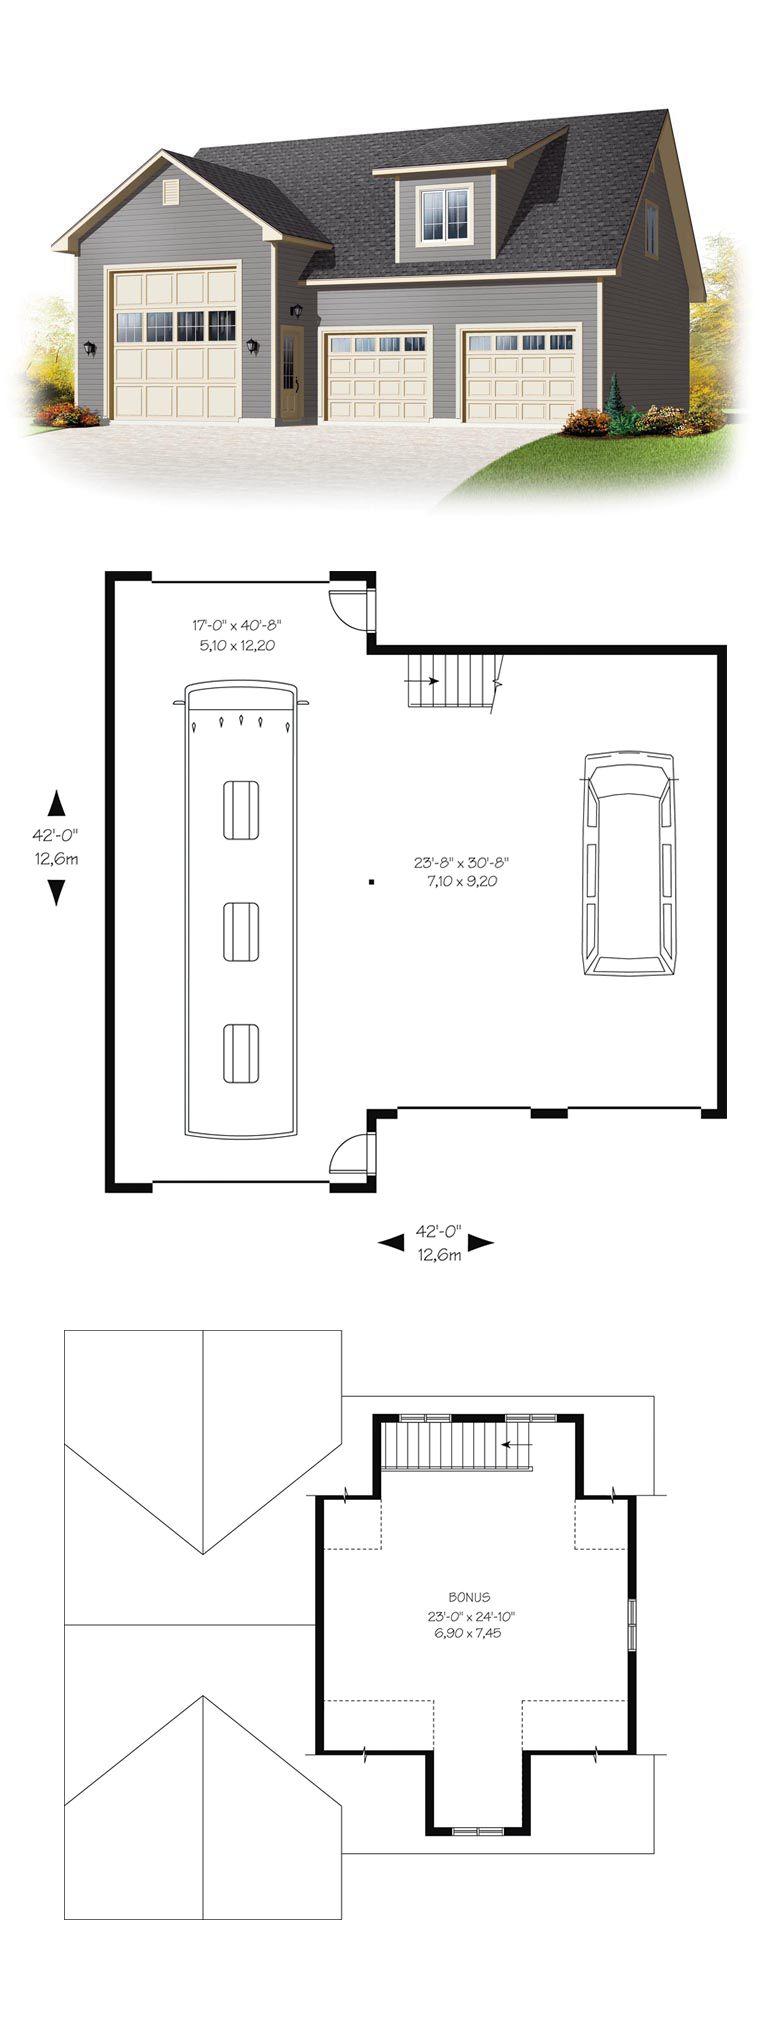 garage plan 76374 bonus area 627 sq ft garage area 1527 sq ft